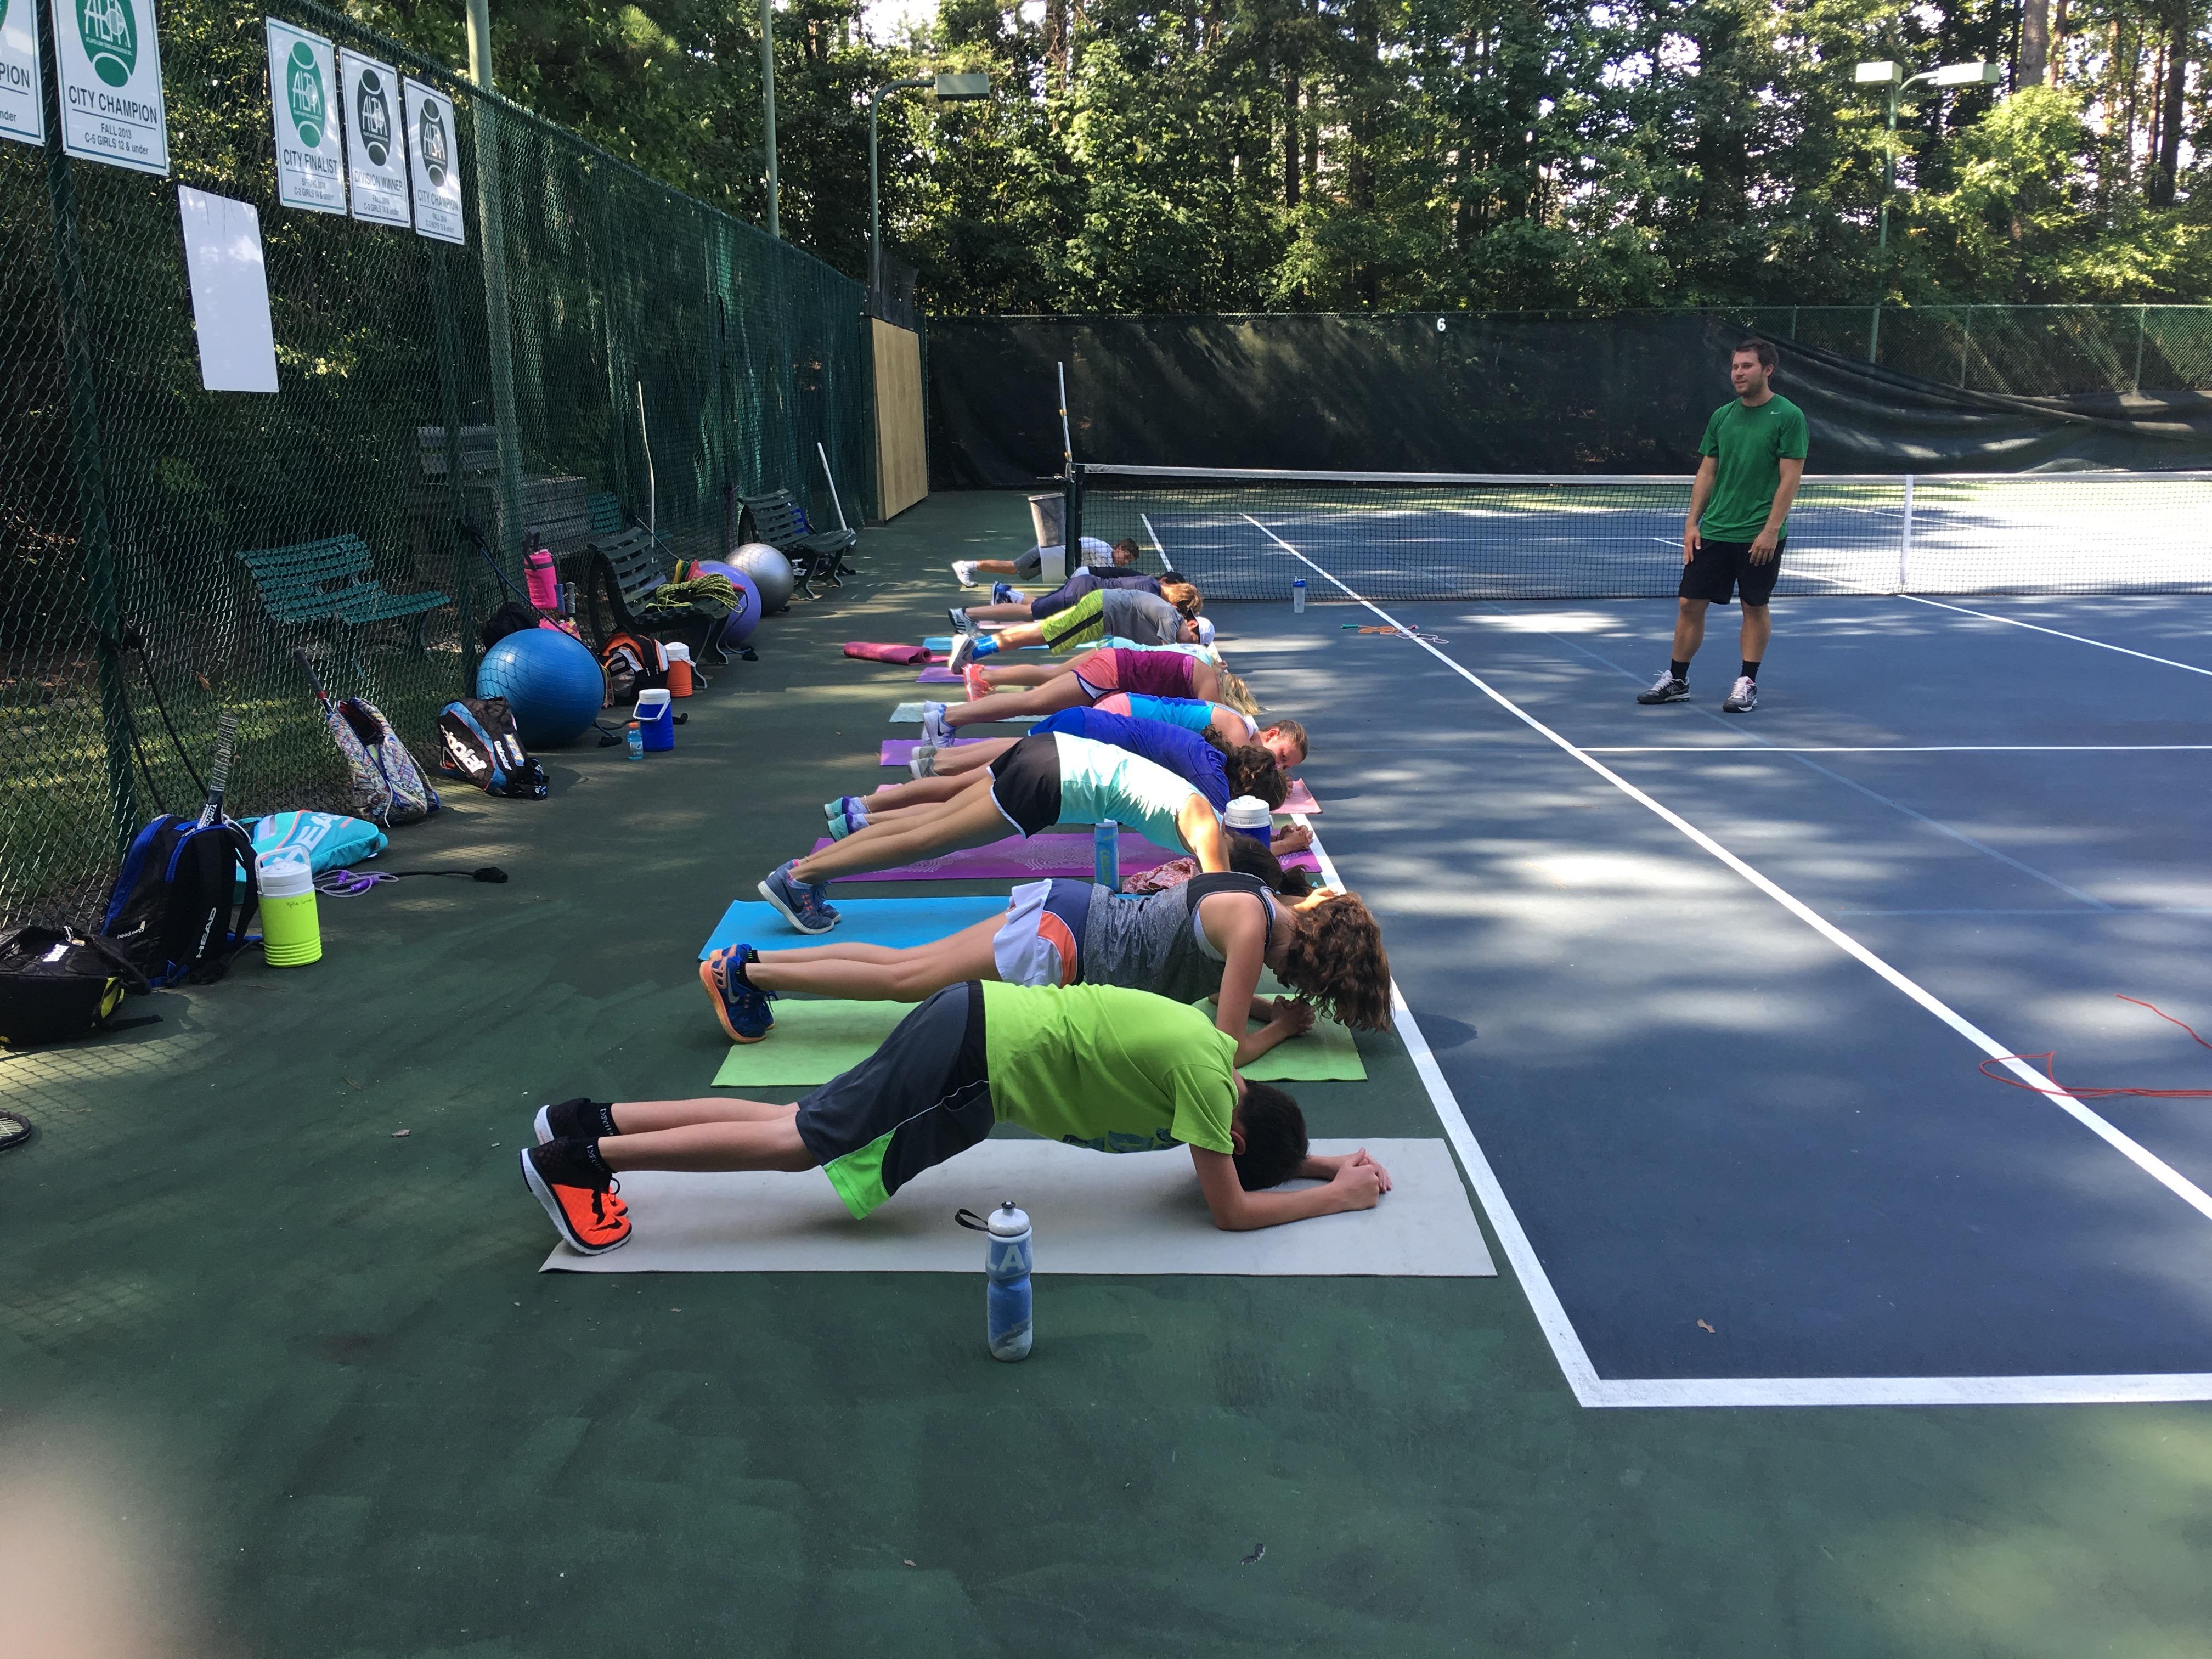 Tennis Arukat Academy